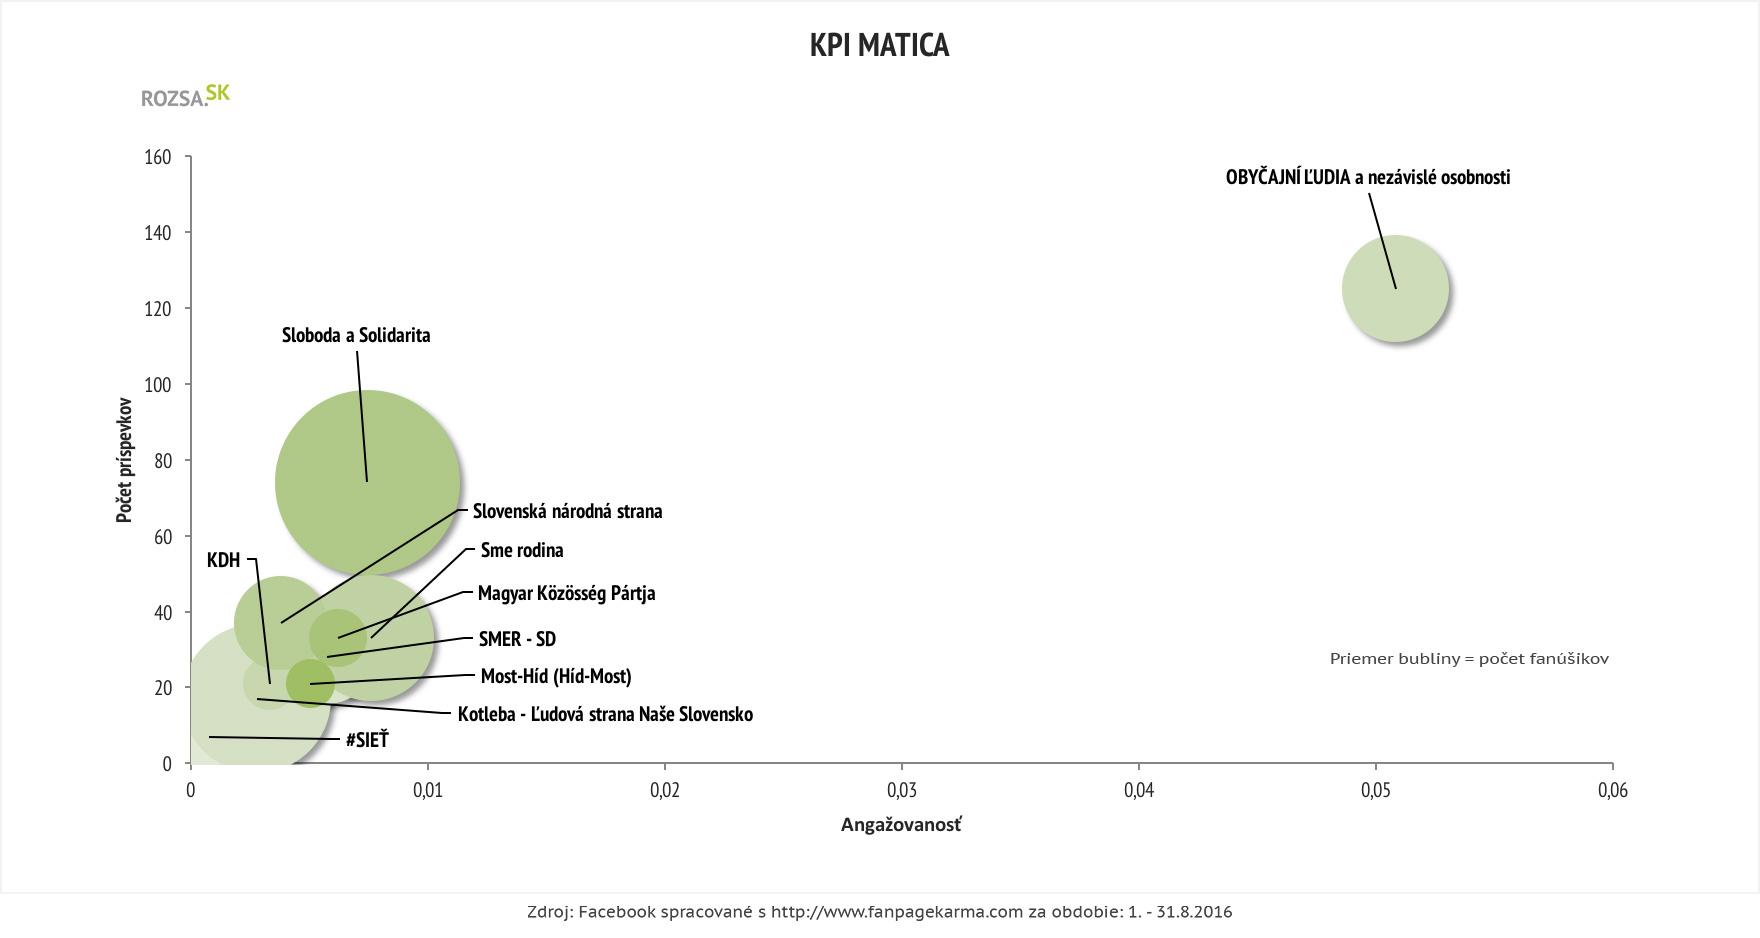 KPI matica, politické strany, Facebook, august 2016